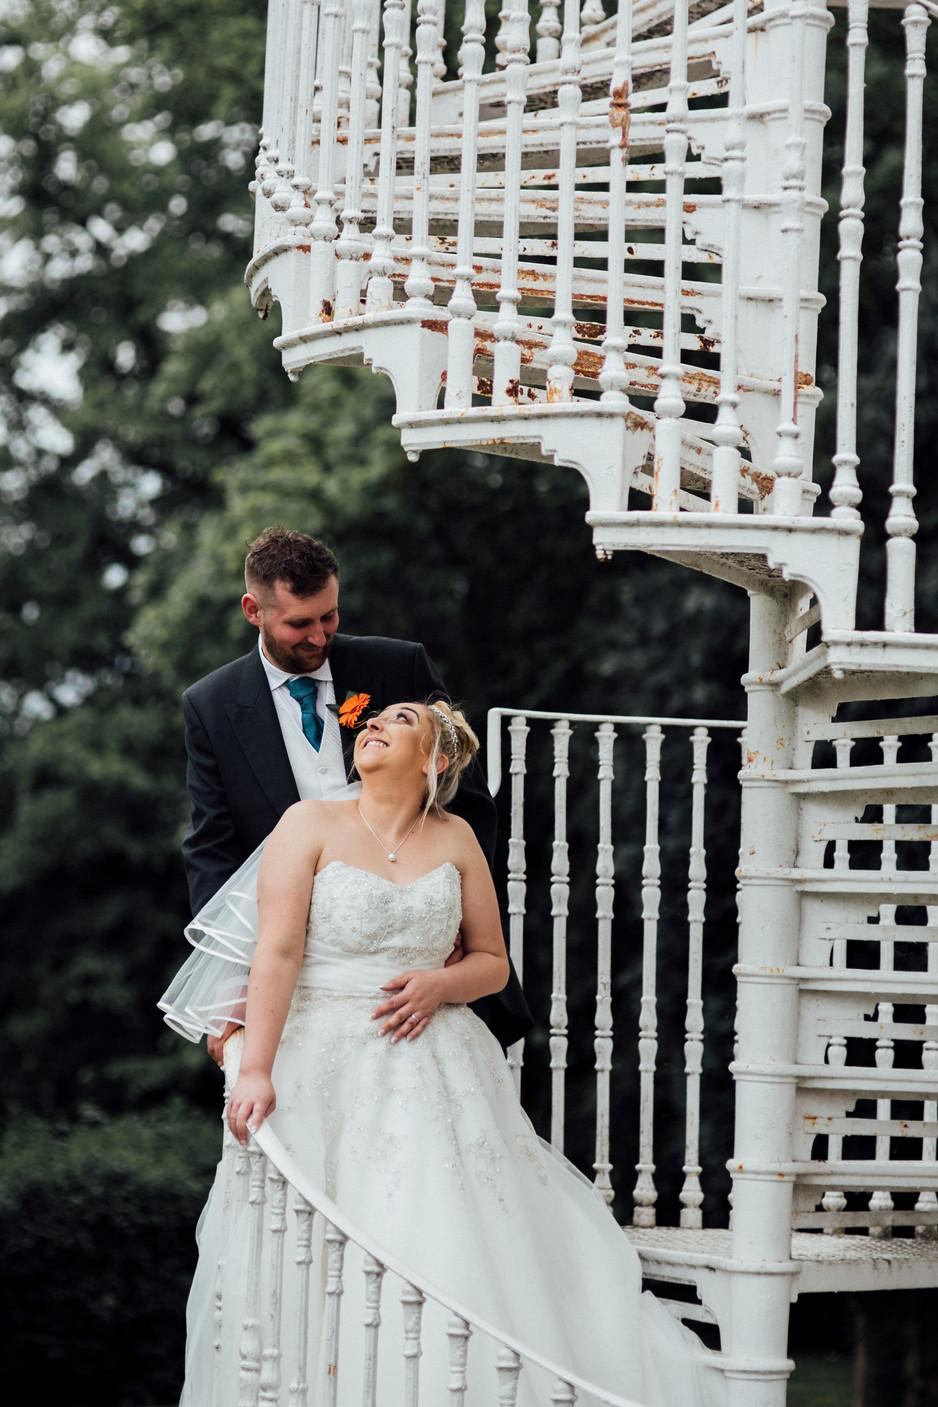 Dunkenhalgh Hotel saircase wedding photography